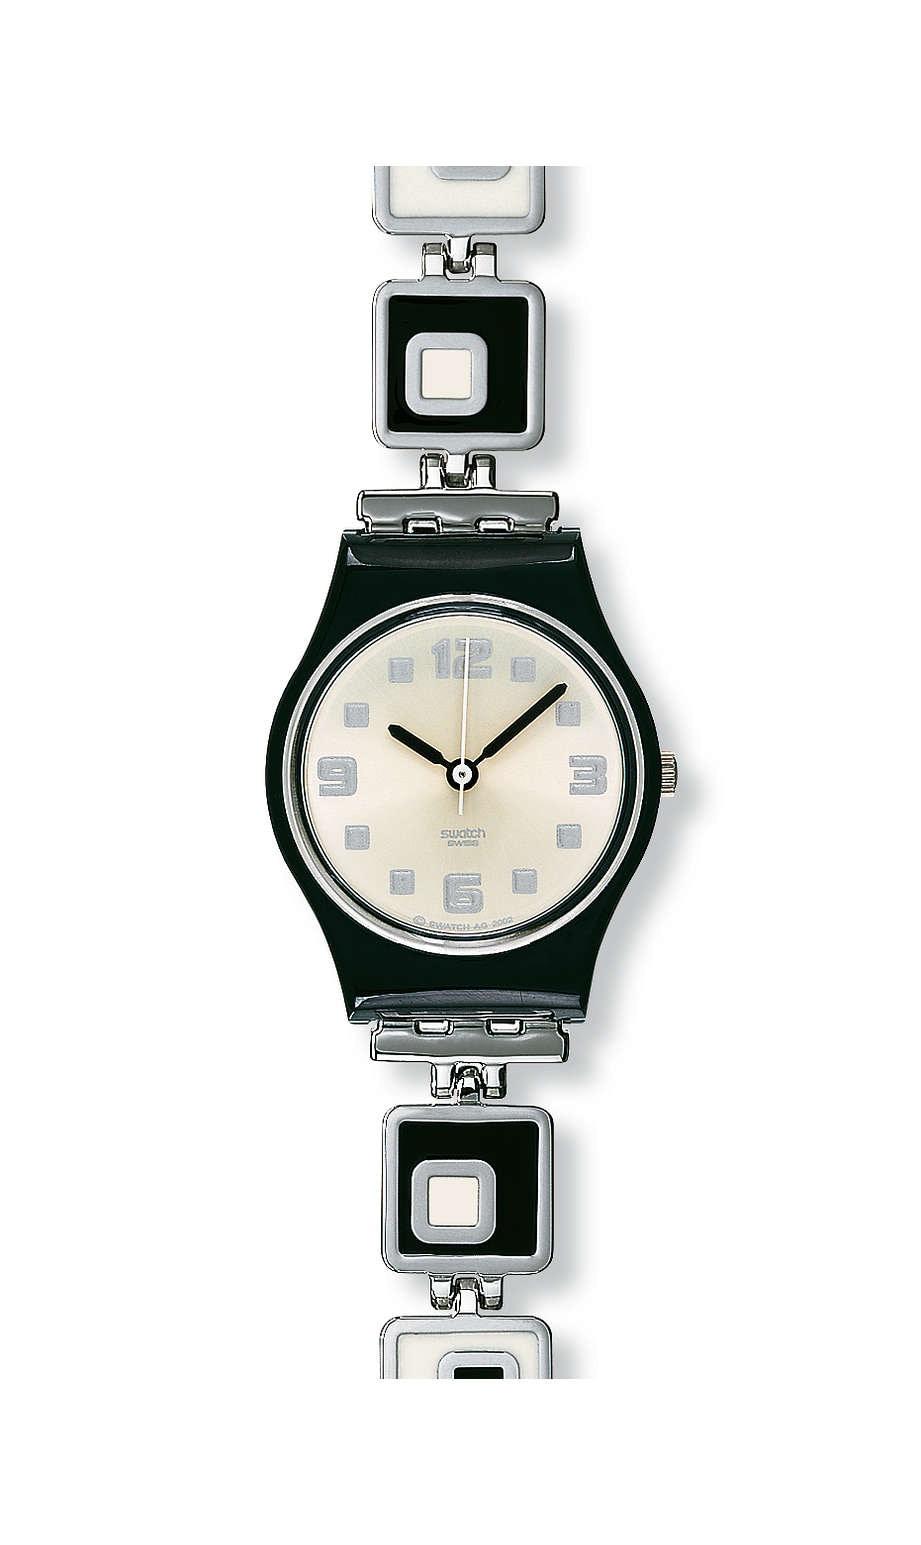 Swatch - CHESSBOARD - 1